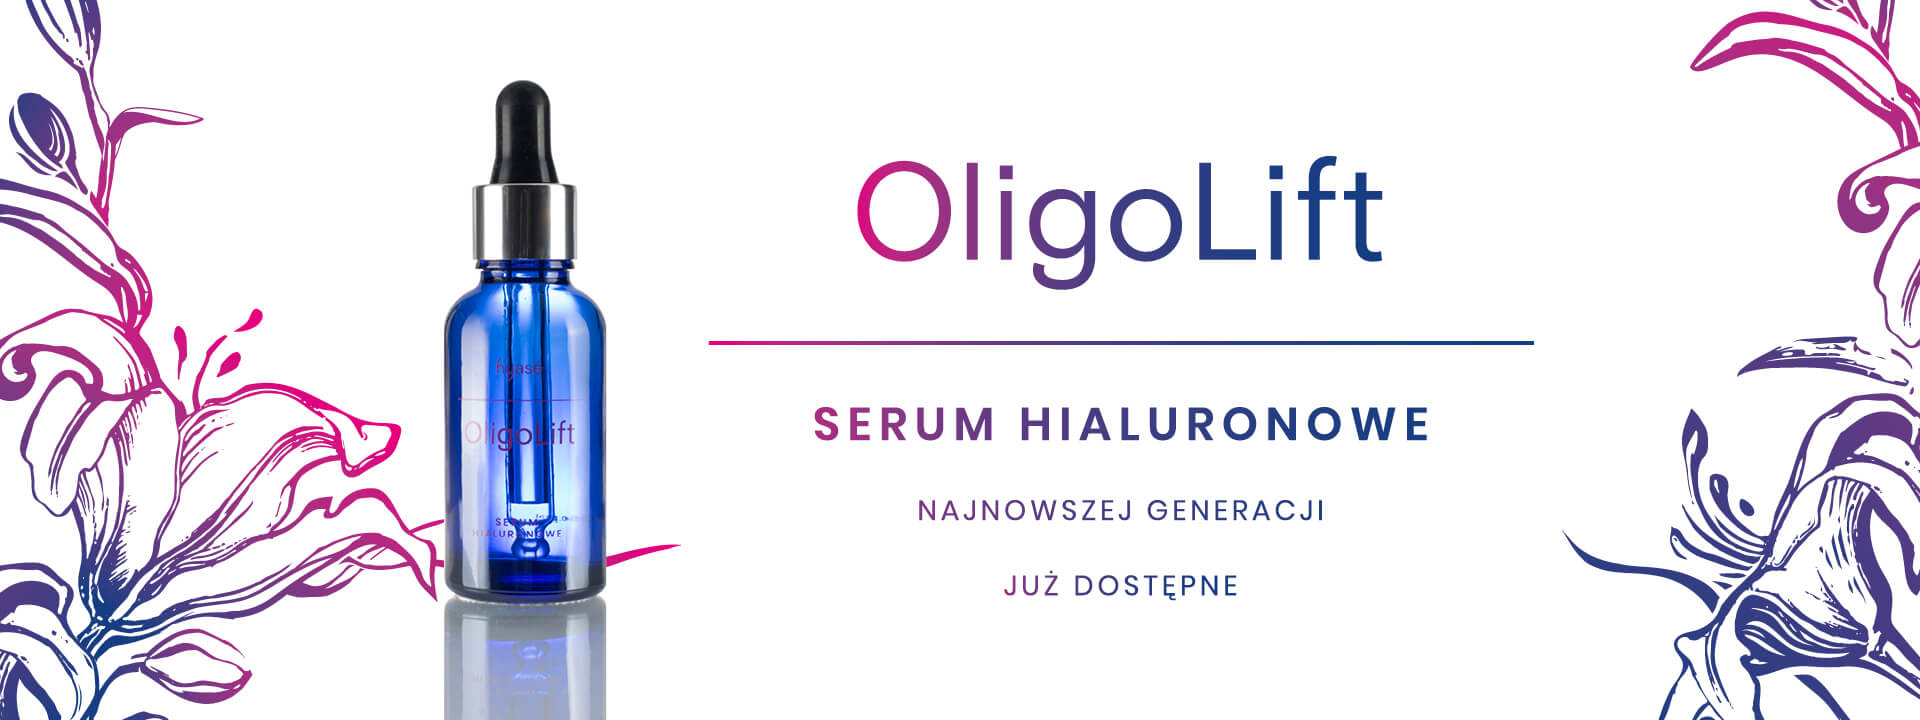 Hyase OligoLift Serum Hialuronowe Kwas Hialuronowy